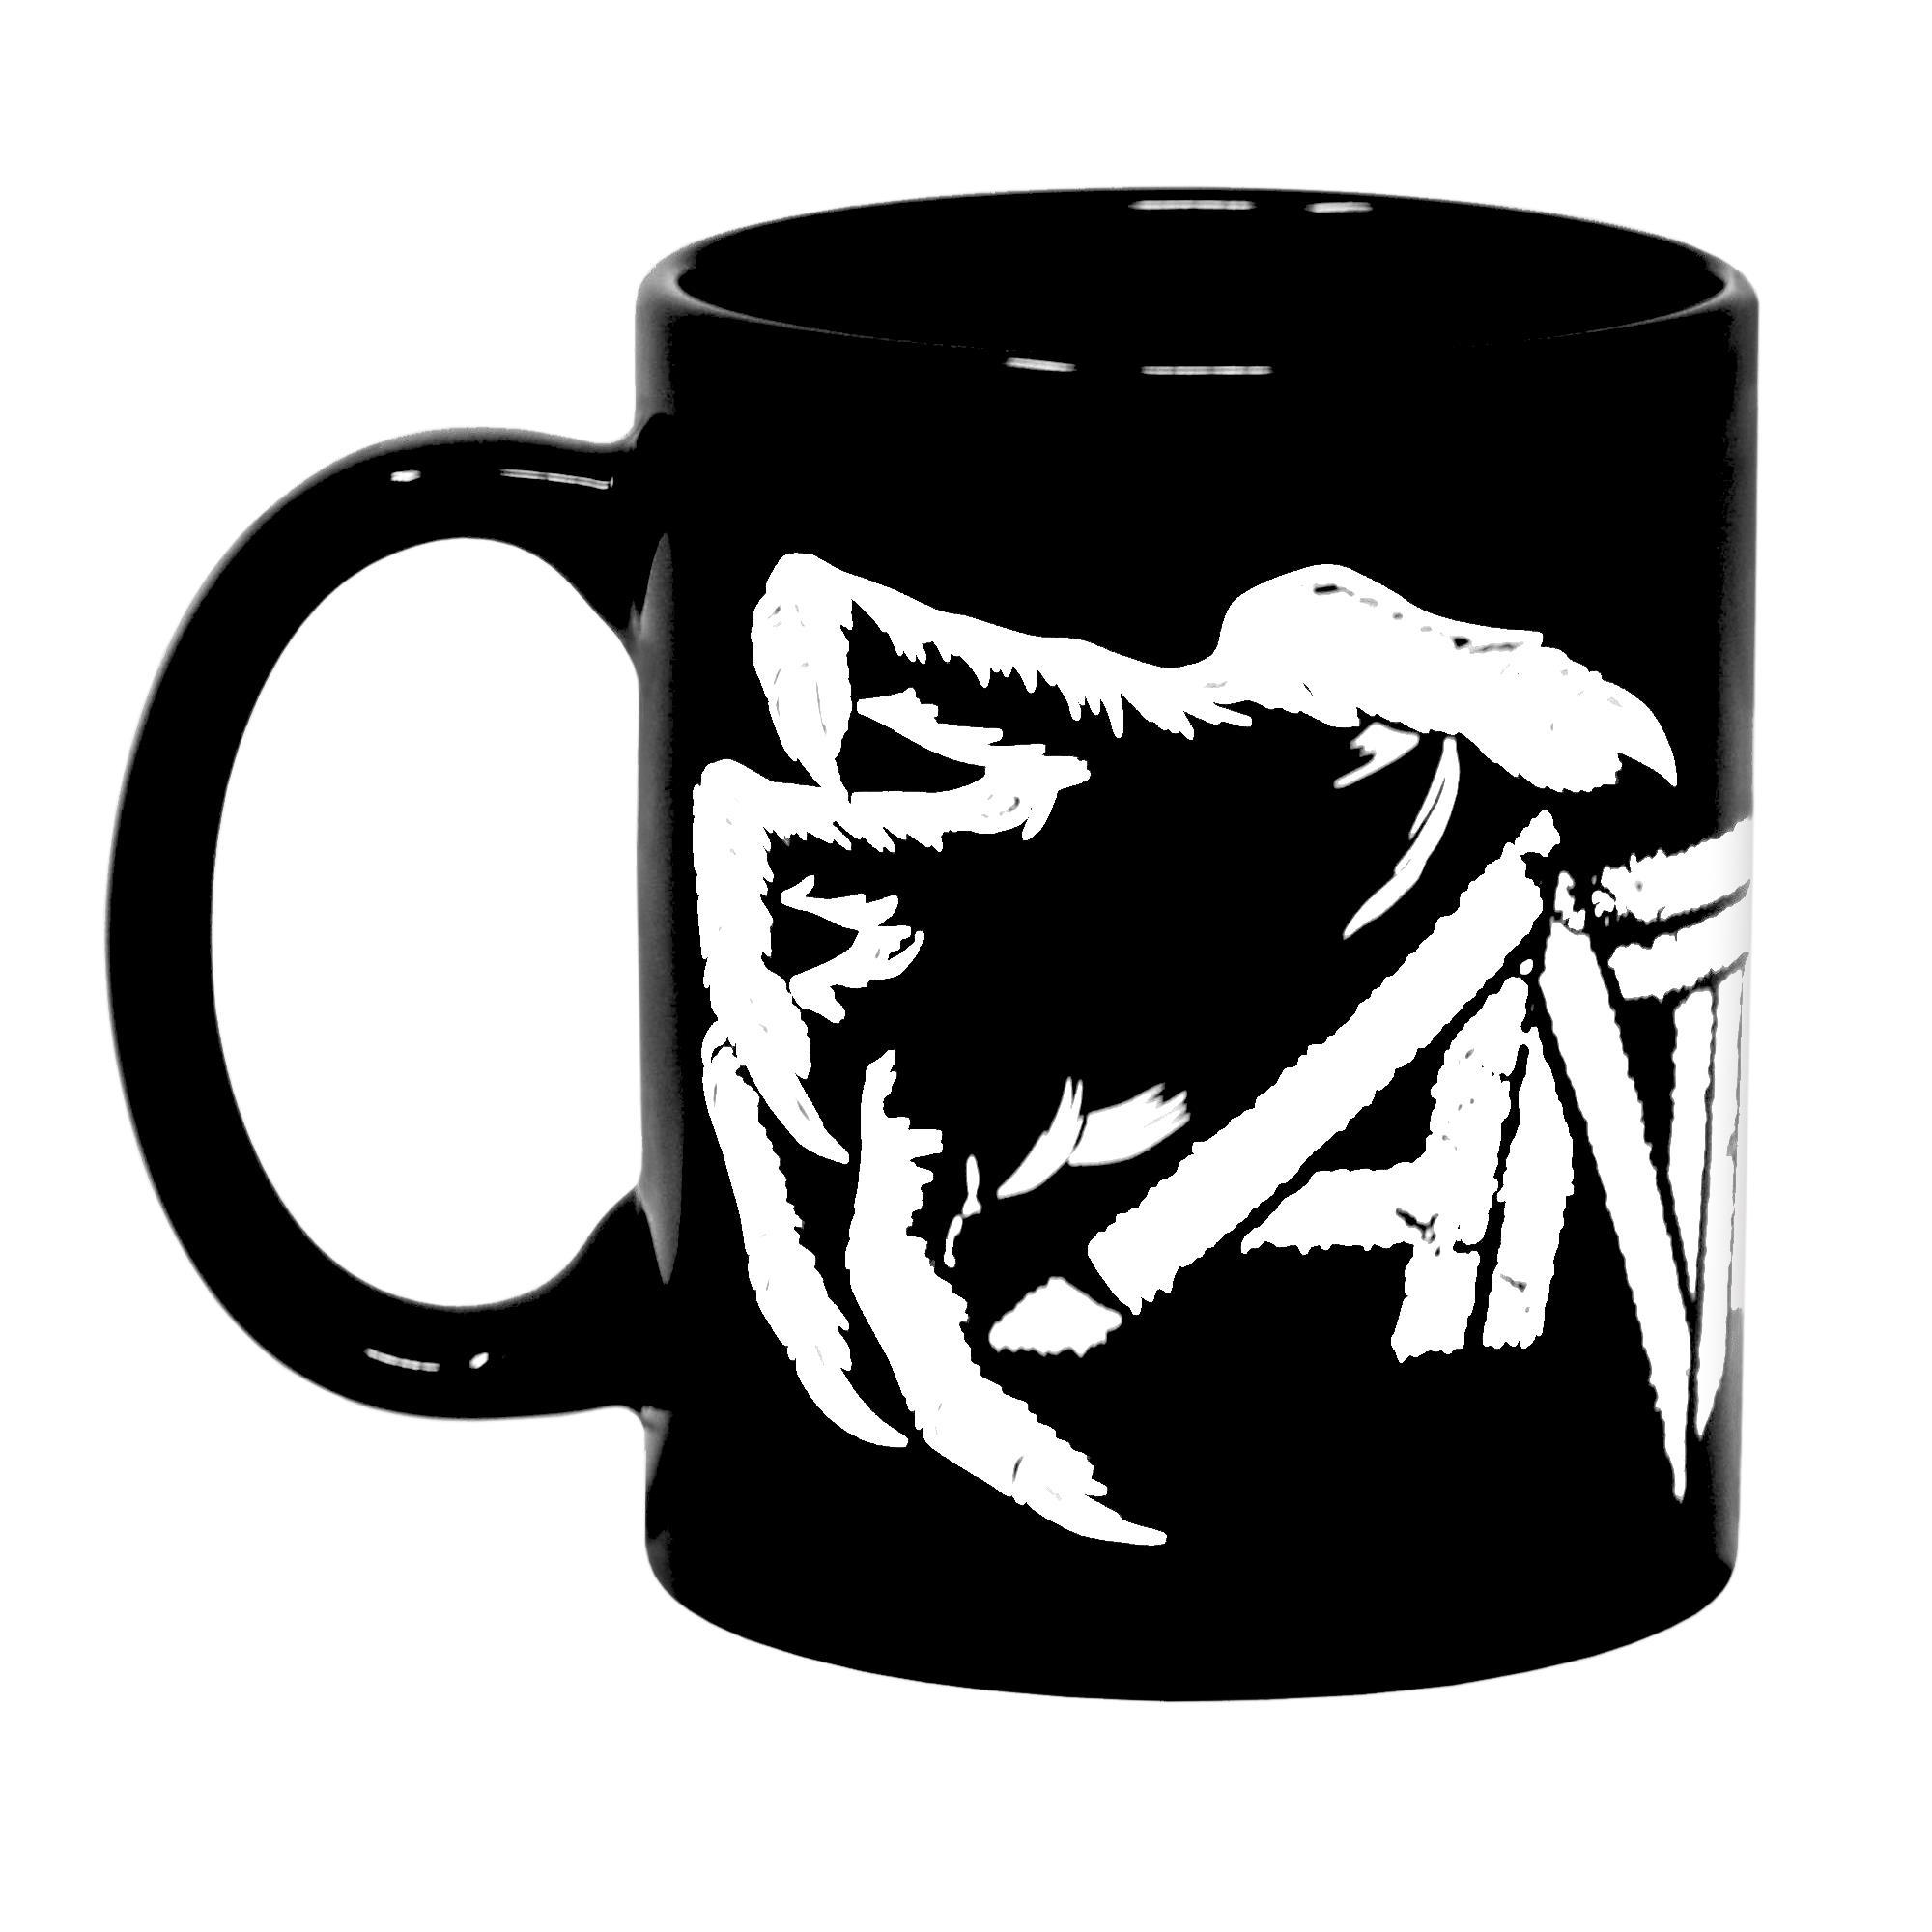 Death Hands Mug